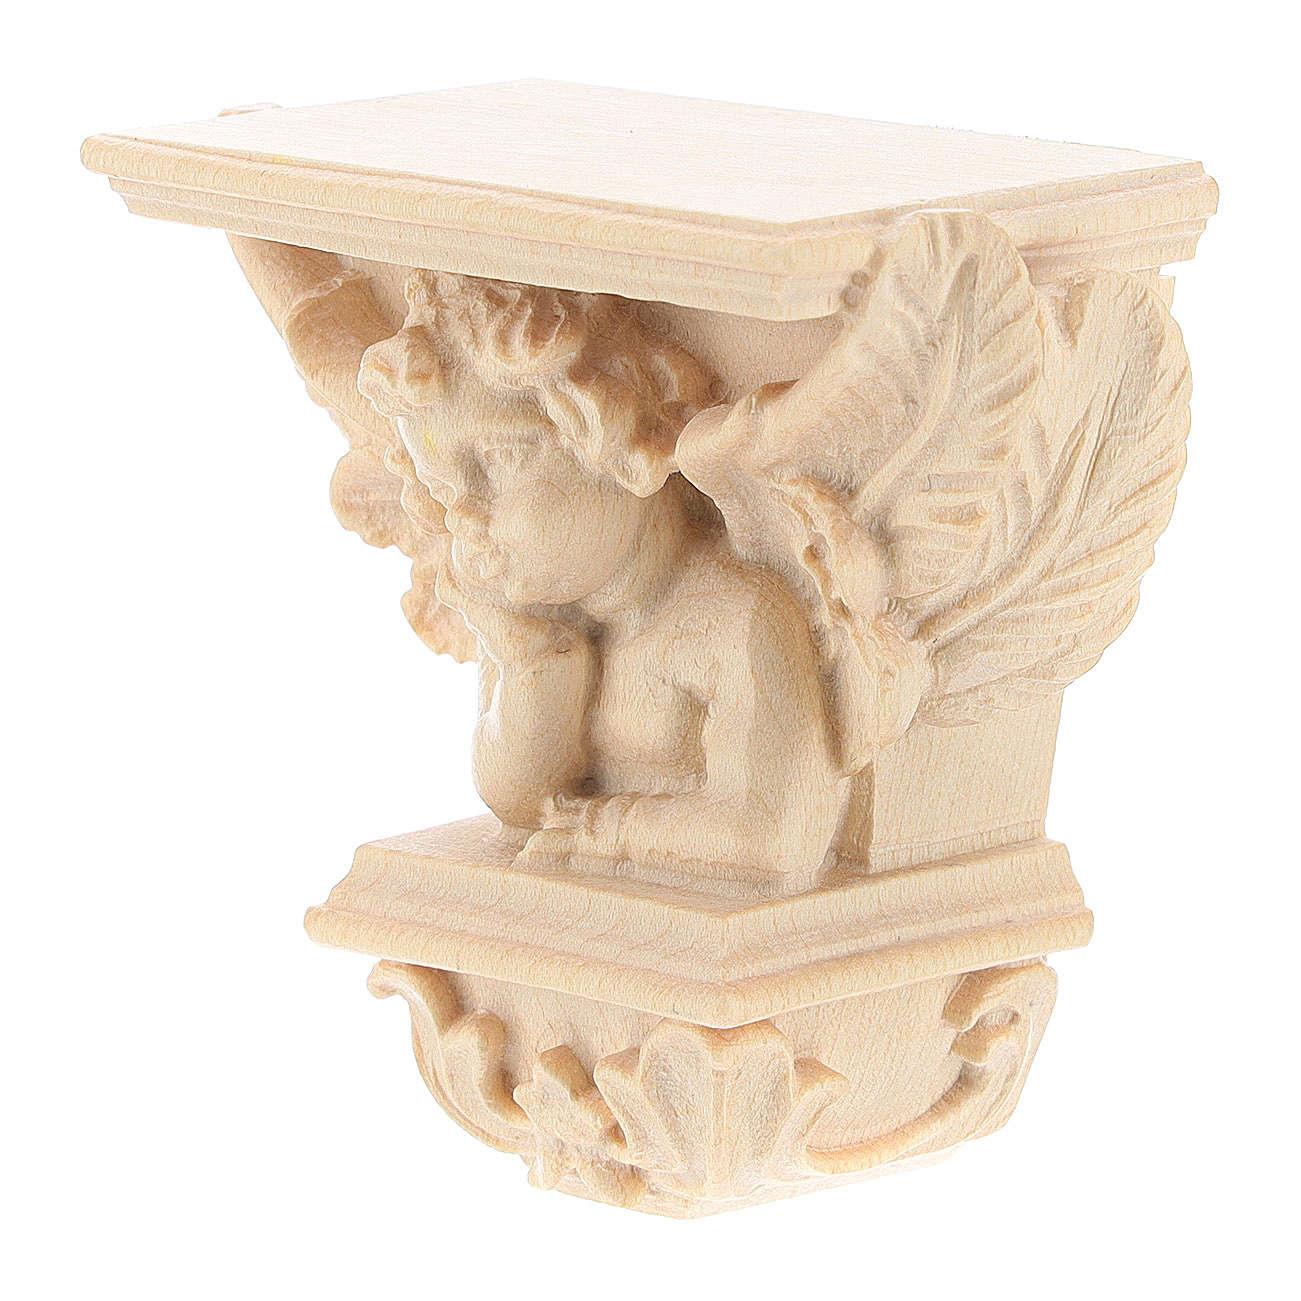 Wall shelf for statues, Raffaello model, natural wax 4